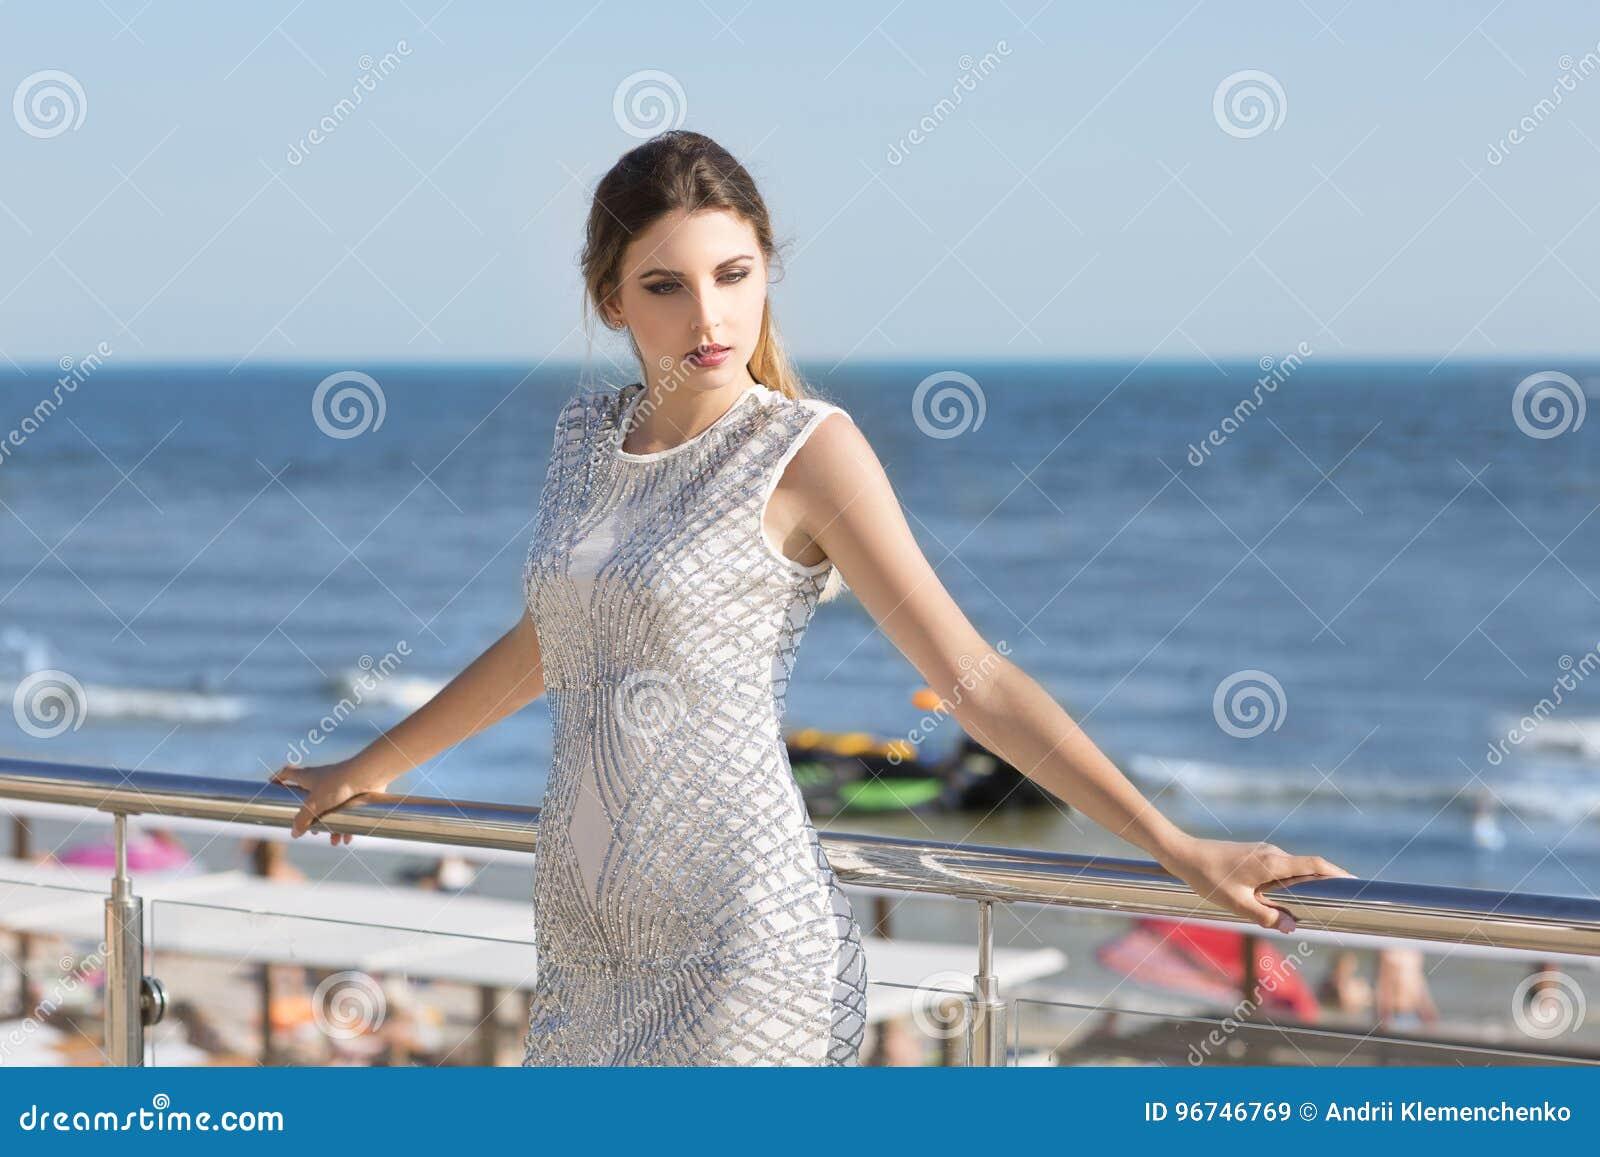 15176b757127 Μια θαυμάσια κυρία σε ένα χαλαρό και λαμπρό άσπρο φόρεμα σε ένα διαφανές  μπαλκόνι ξενοδοχείων ` s Η πανέμορφη γυναίκα με τη μαζευμένη σκοτεινή τρίχα  είναι ...